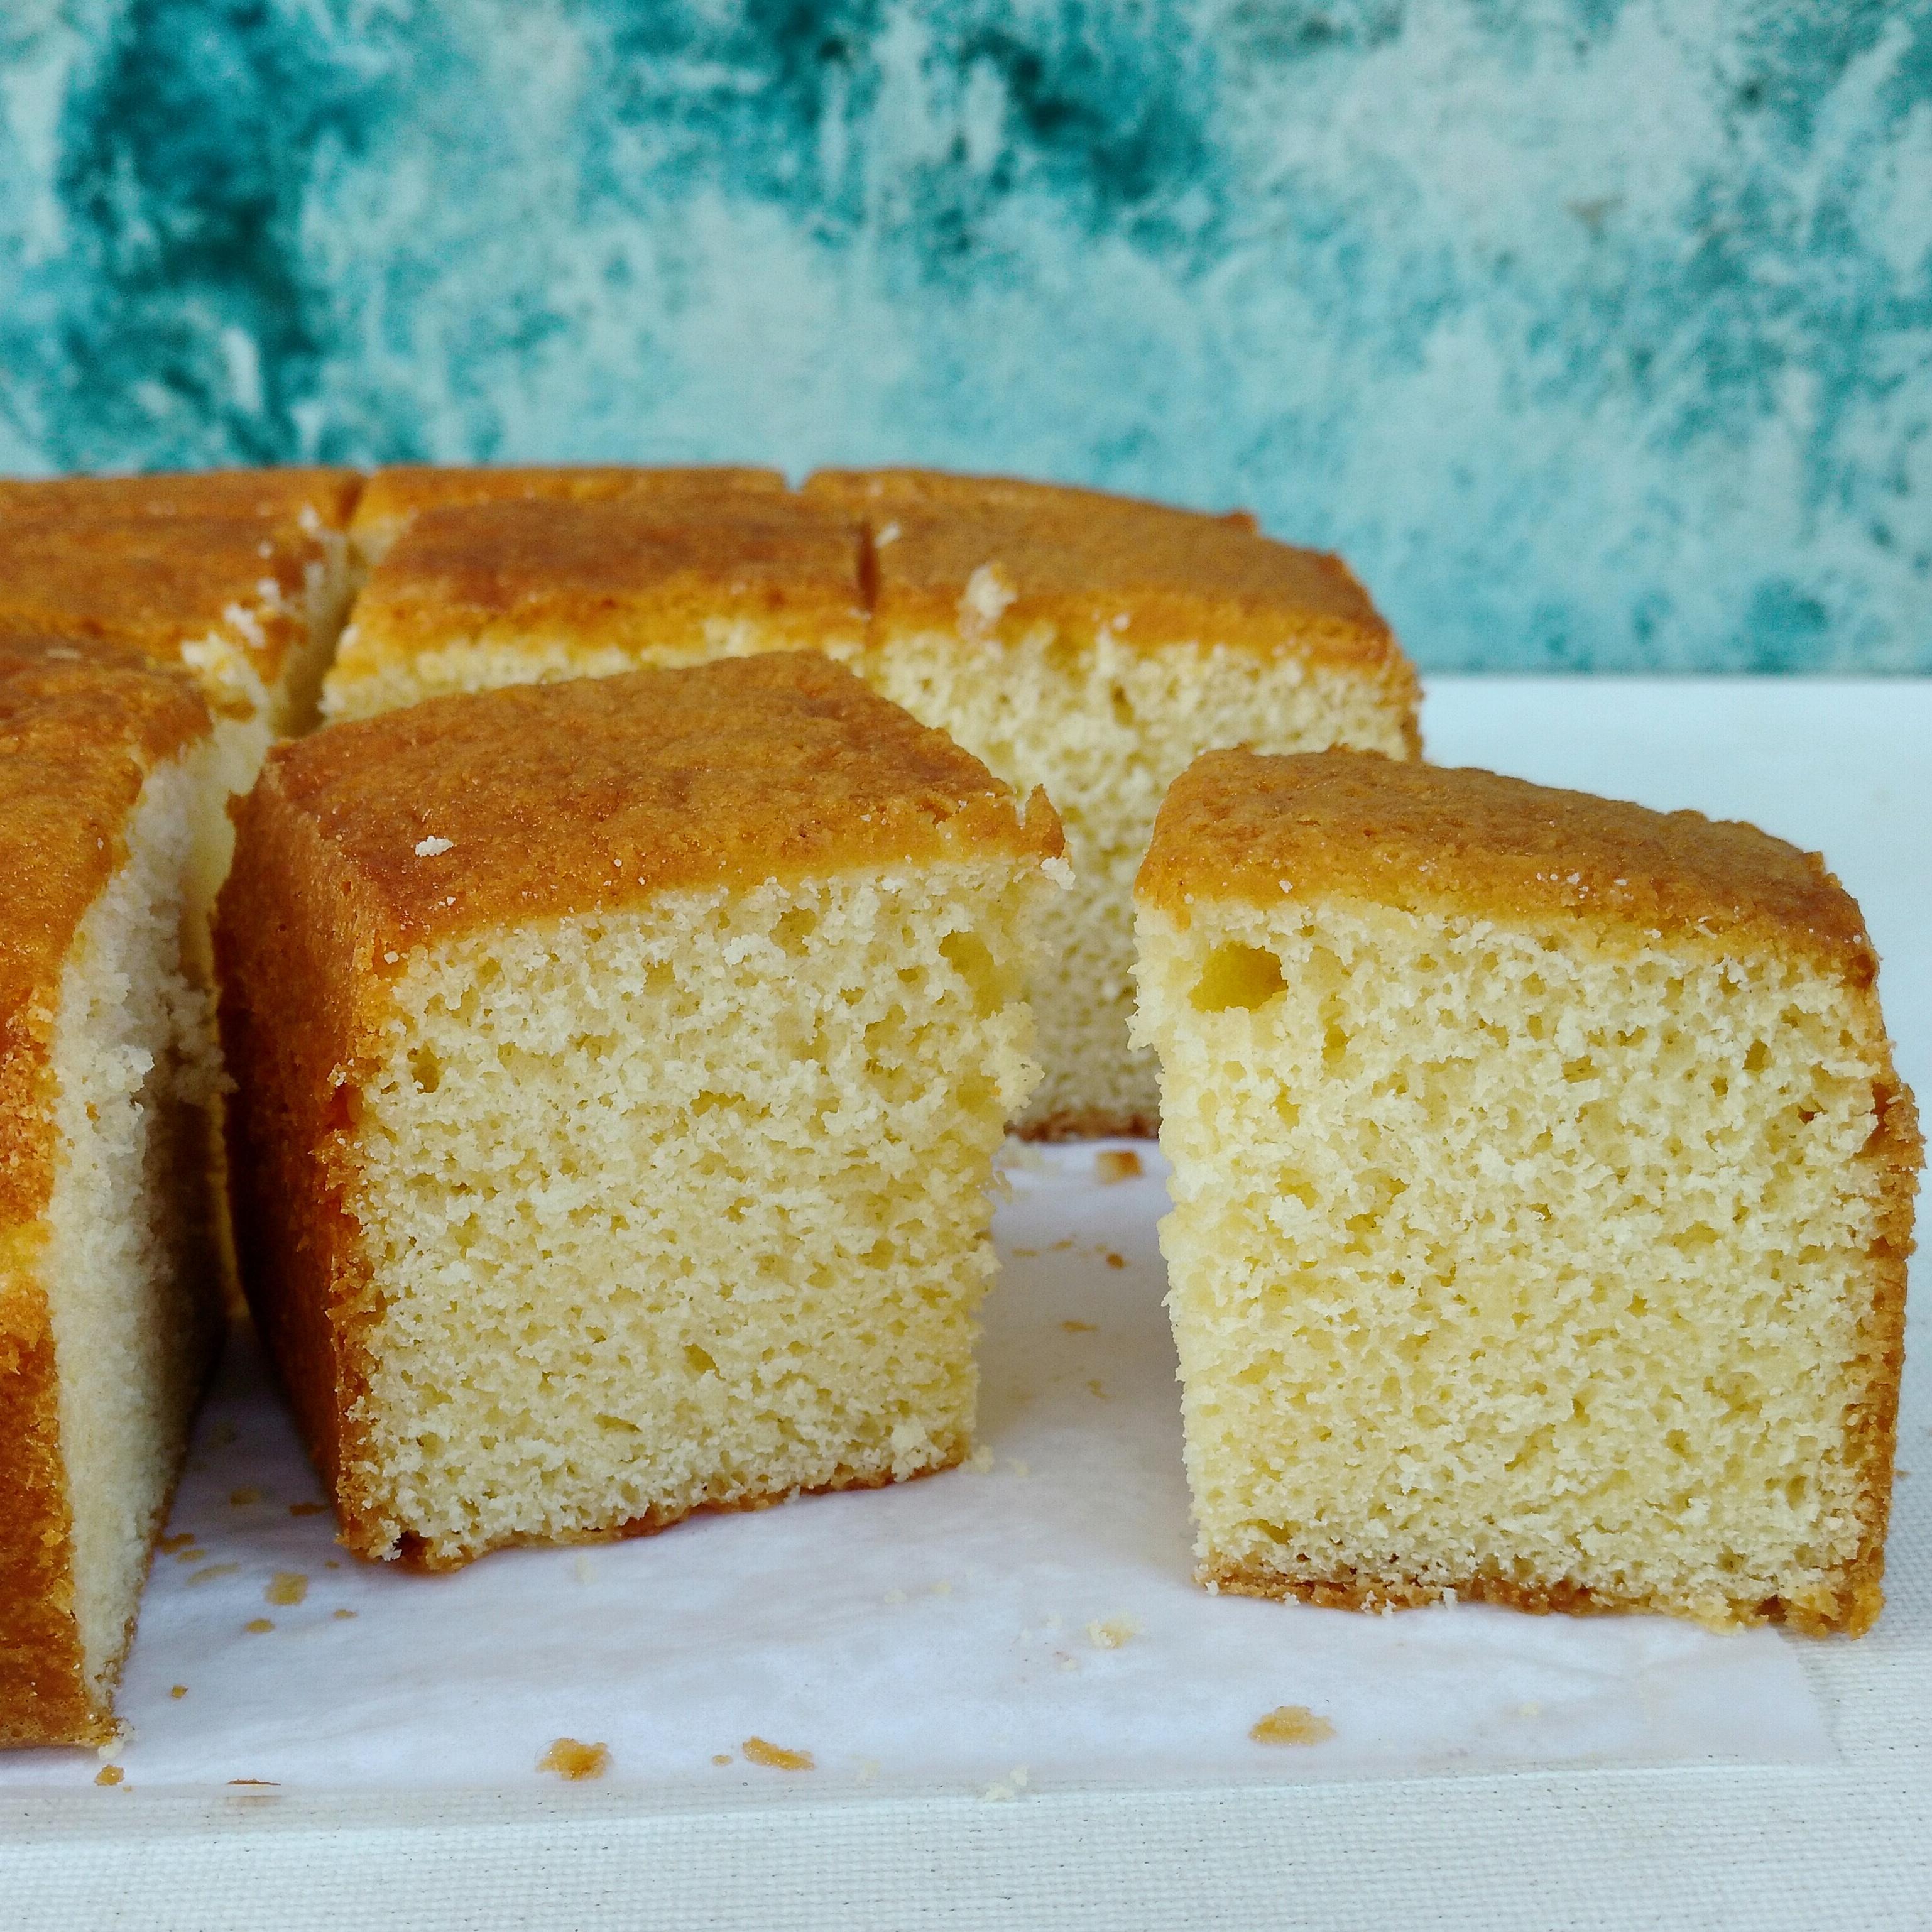 White chocolate sponge cake - FLOURS & FROSTINGS